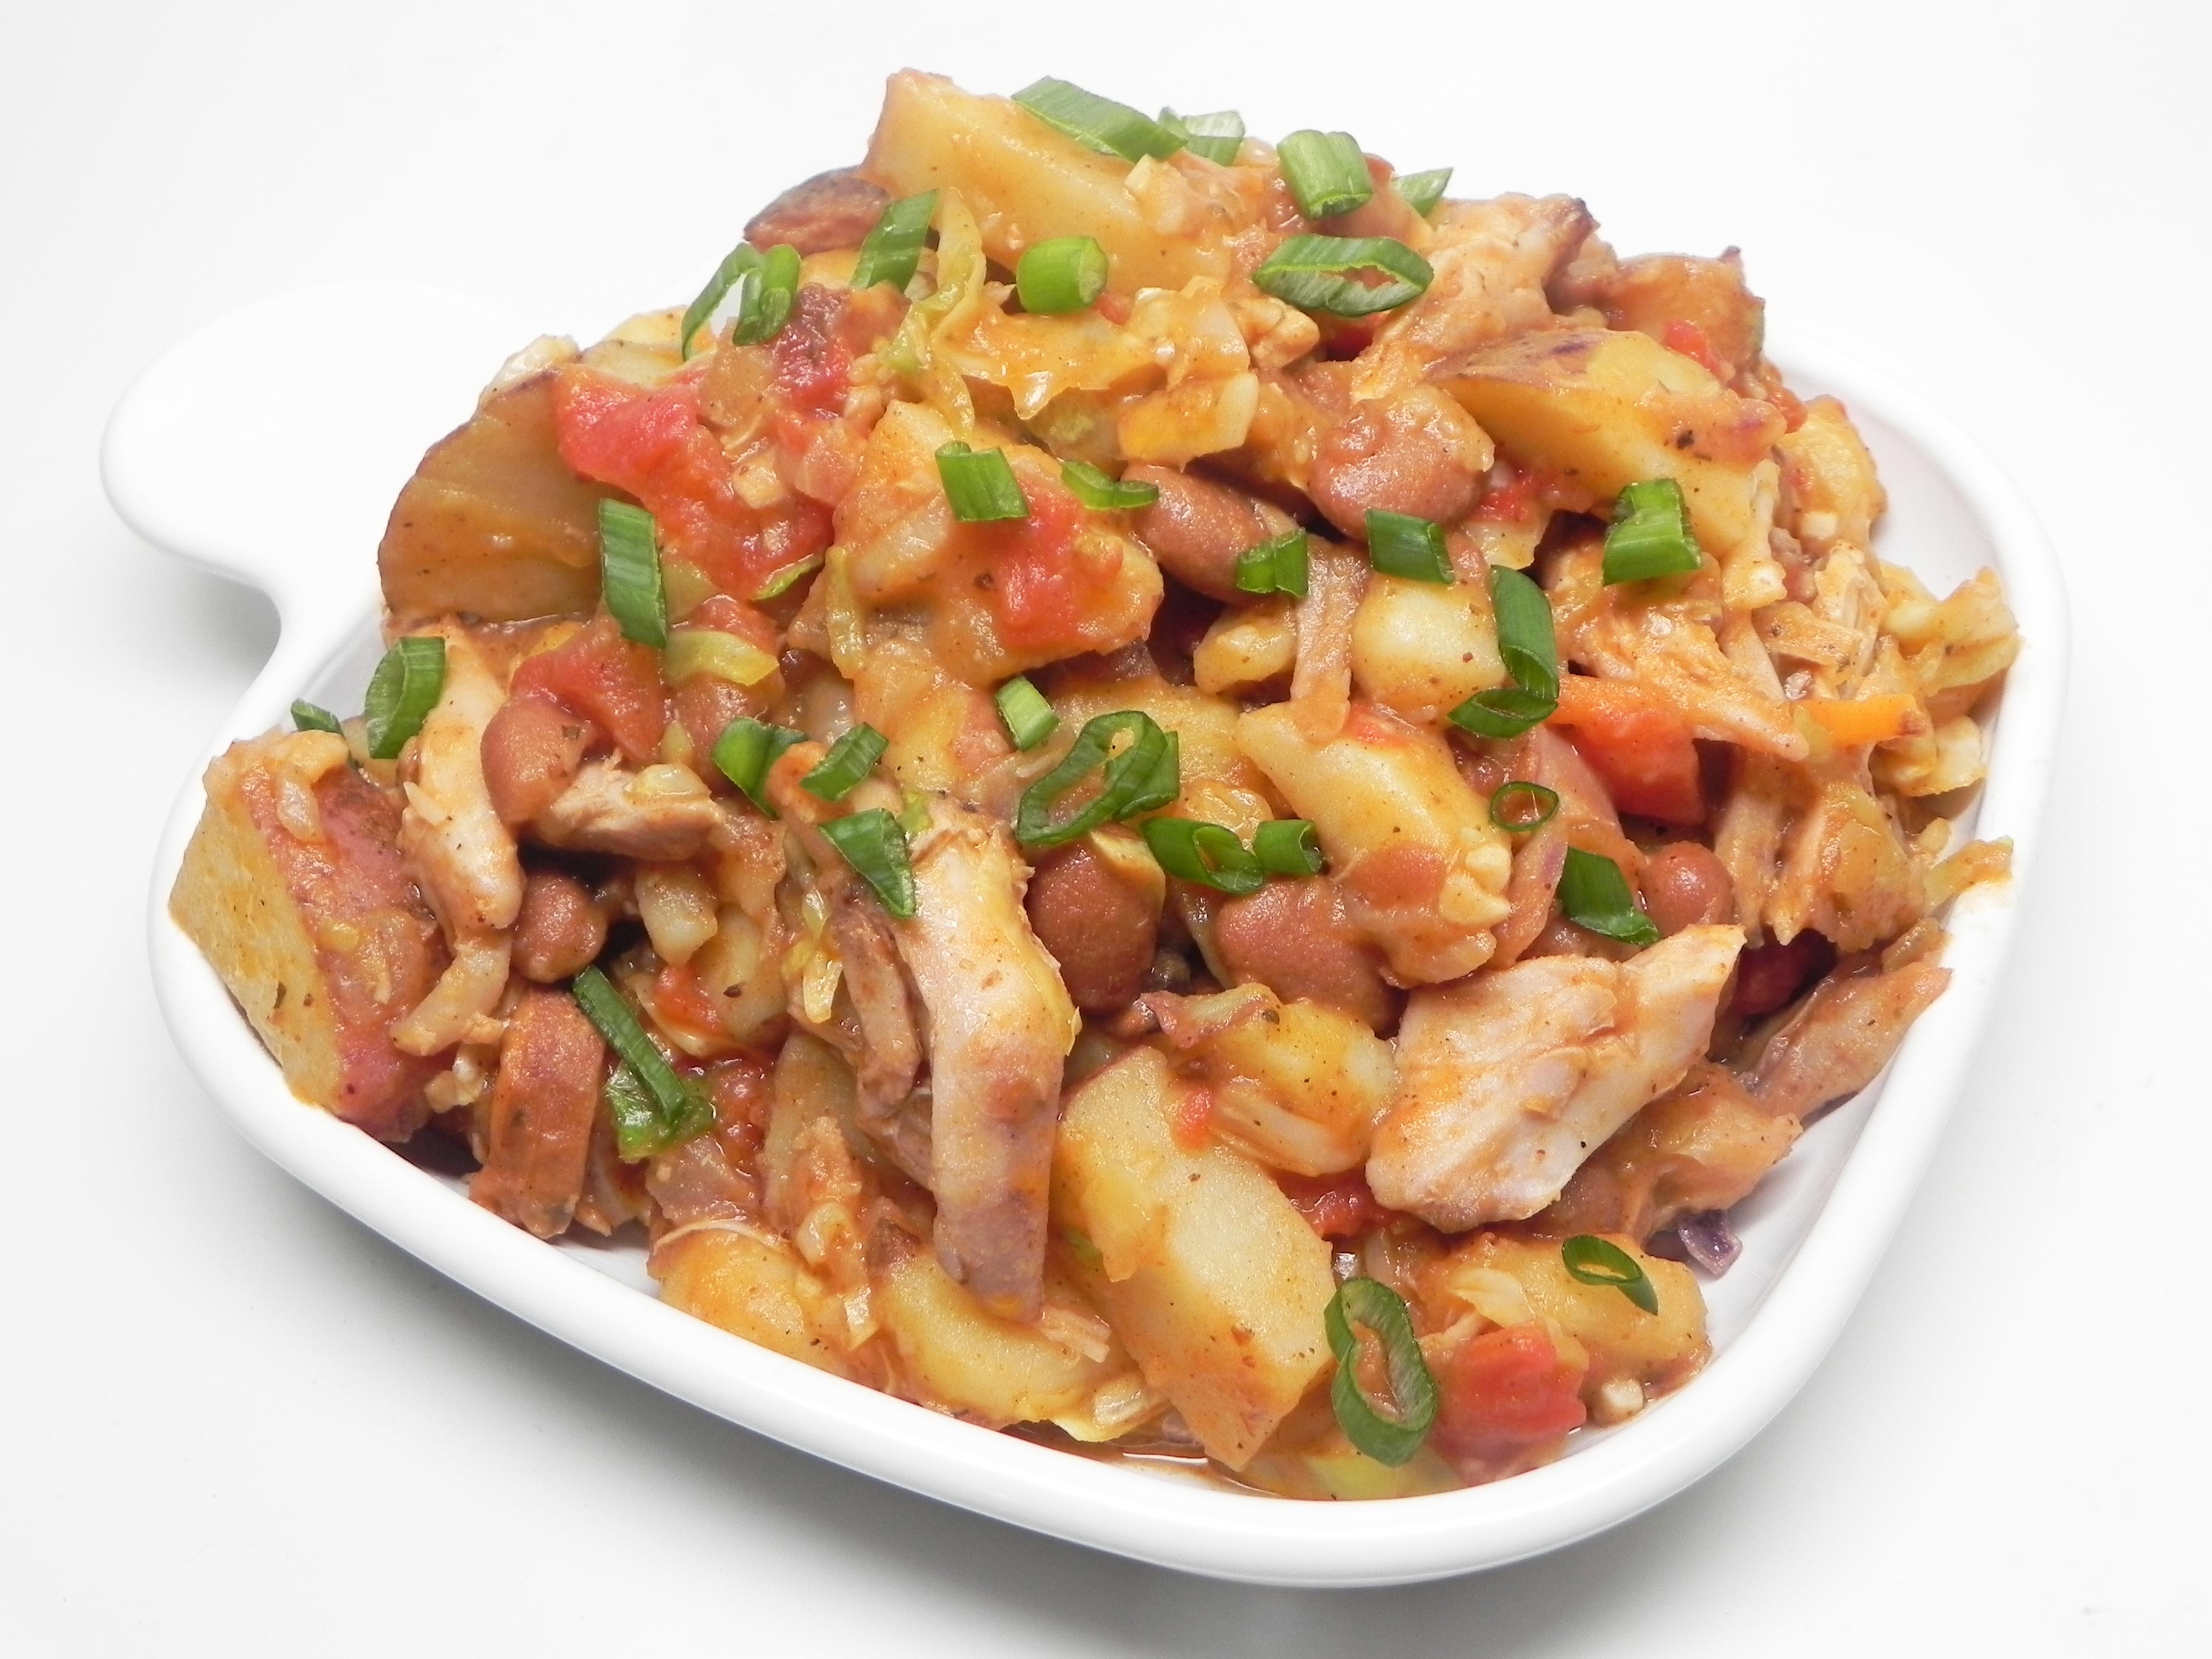 Roasted Potatoes and Smoked Turkey Legs